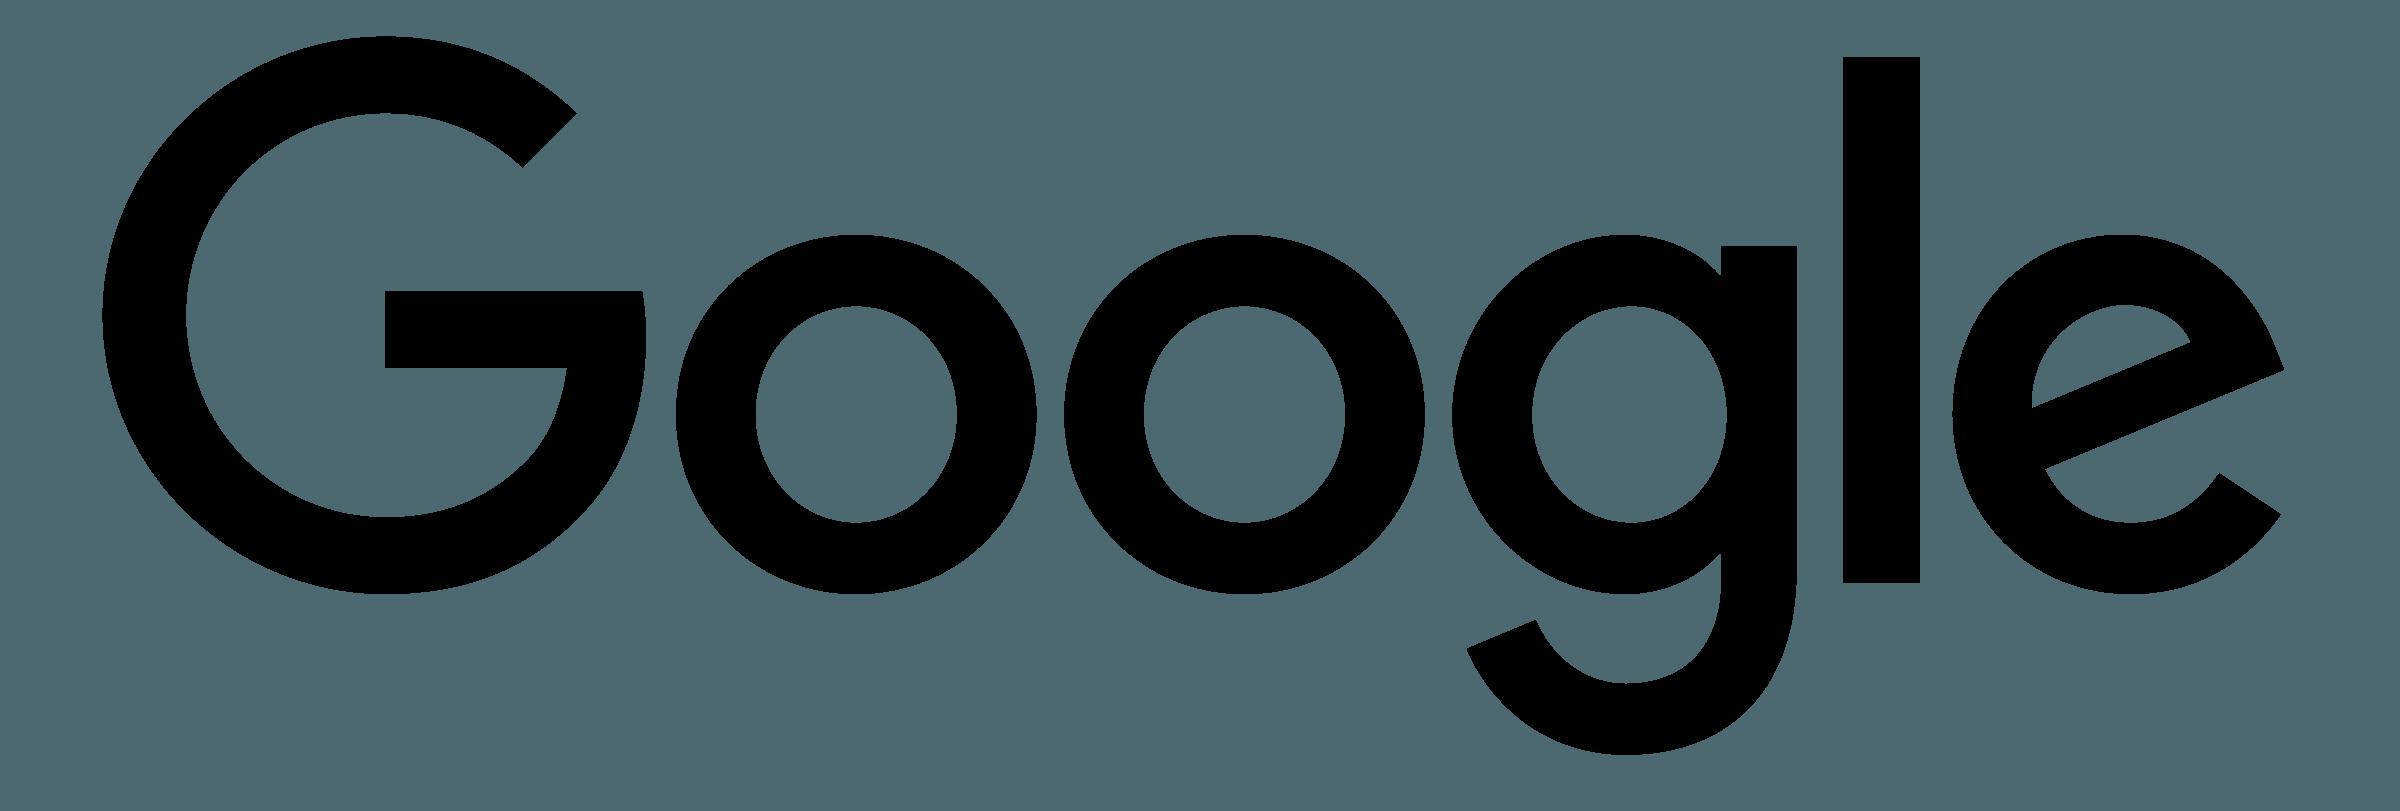 google-logo-black-transparent